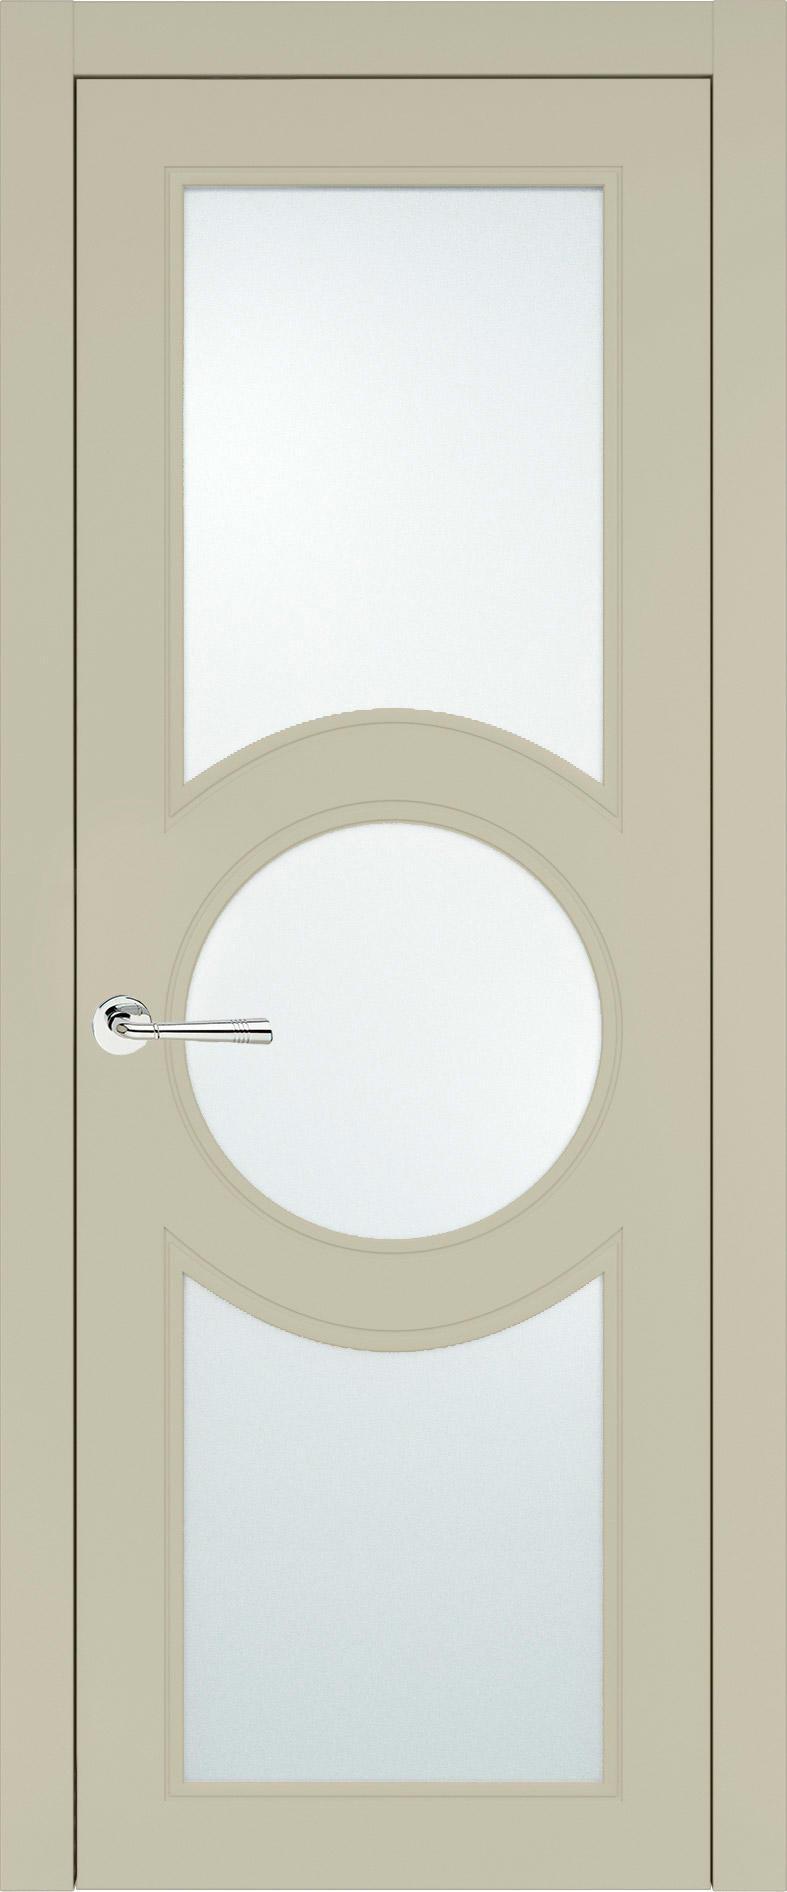 Ravenna Neo Classic цвет - Серо-оливковая эмаль (RAL 7032) Со стеклом (ДО)